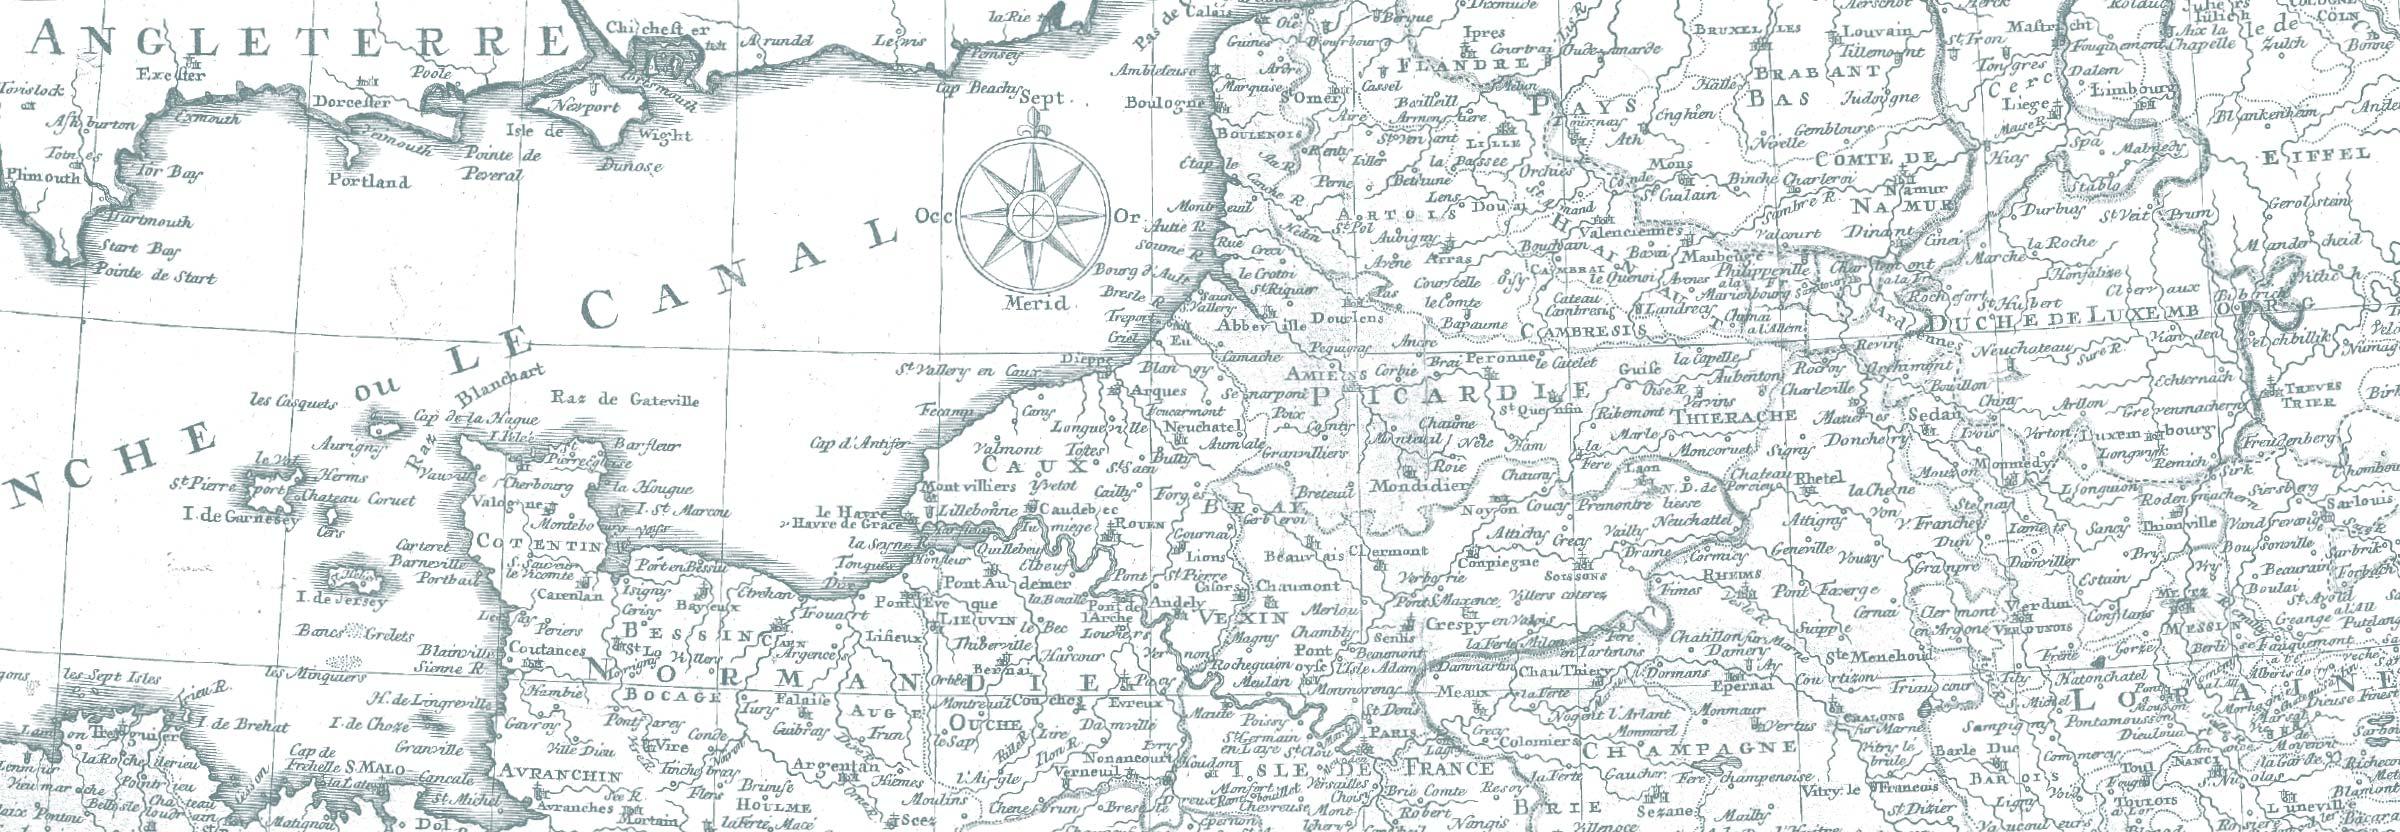 parallax-map-1